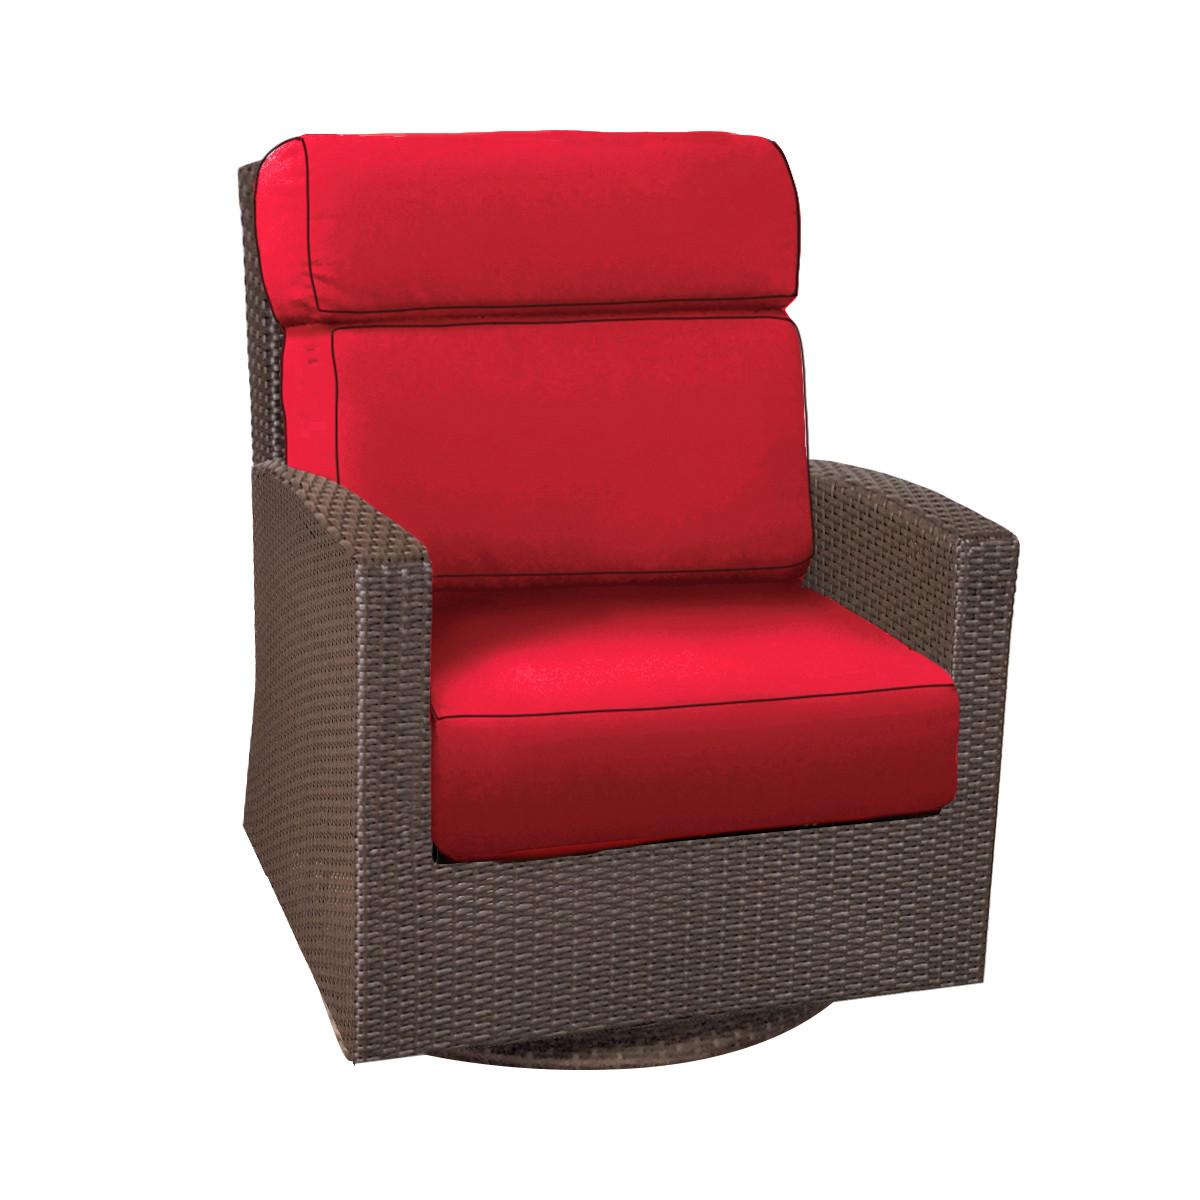 Forever Patio Barbados Wicker High Back Swivel Rocker Club Chair Ebony,  Flagship Ruby With Canvas